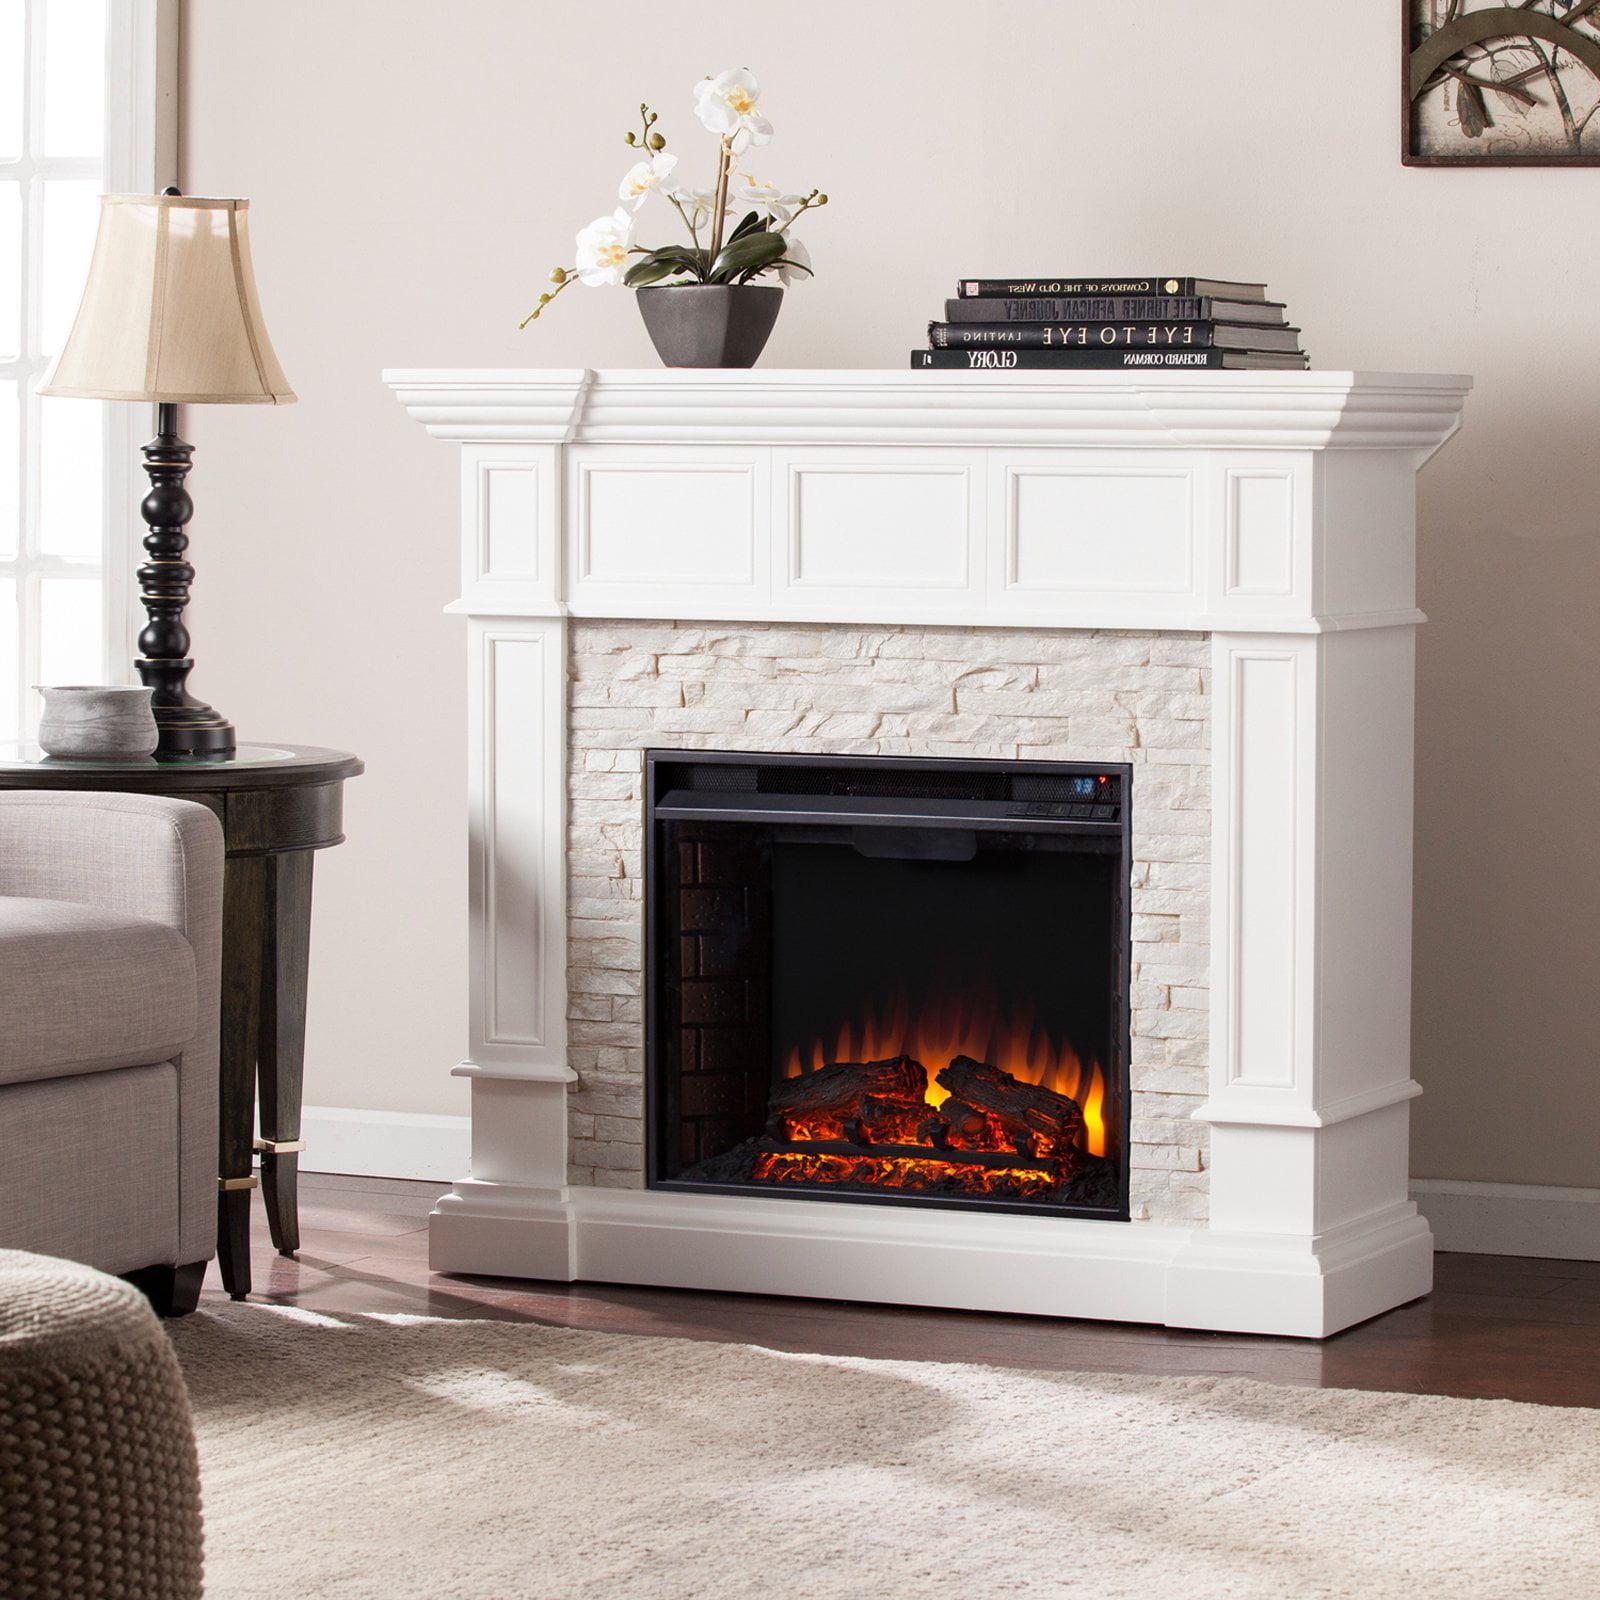 Southern Enterprises Merrimack Electric Fireplace by Southern Enterprises